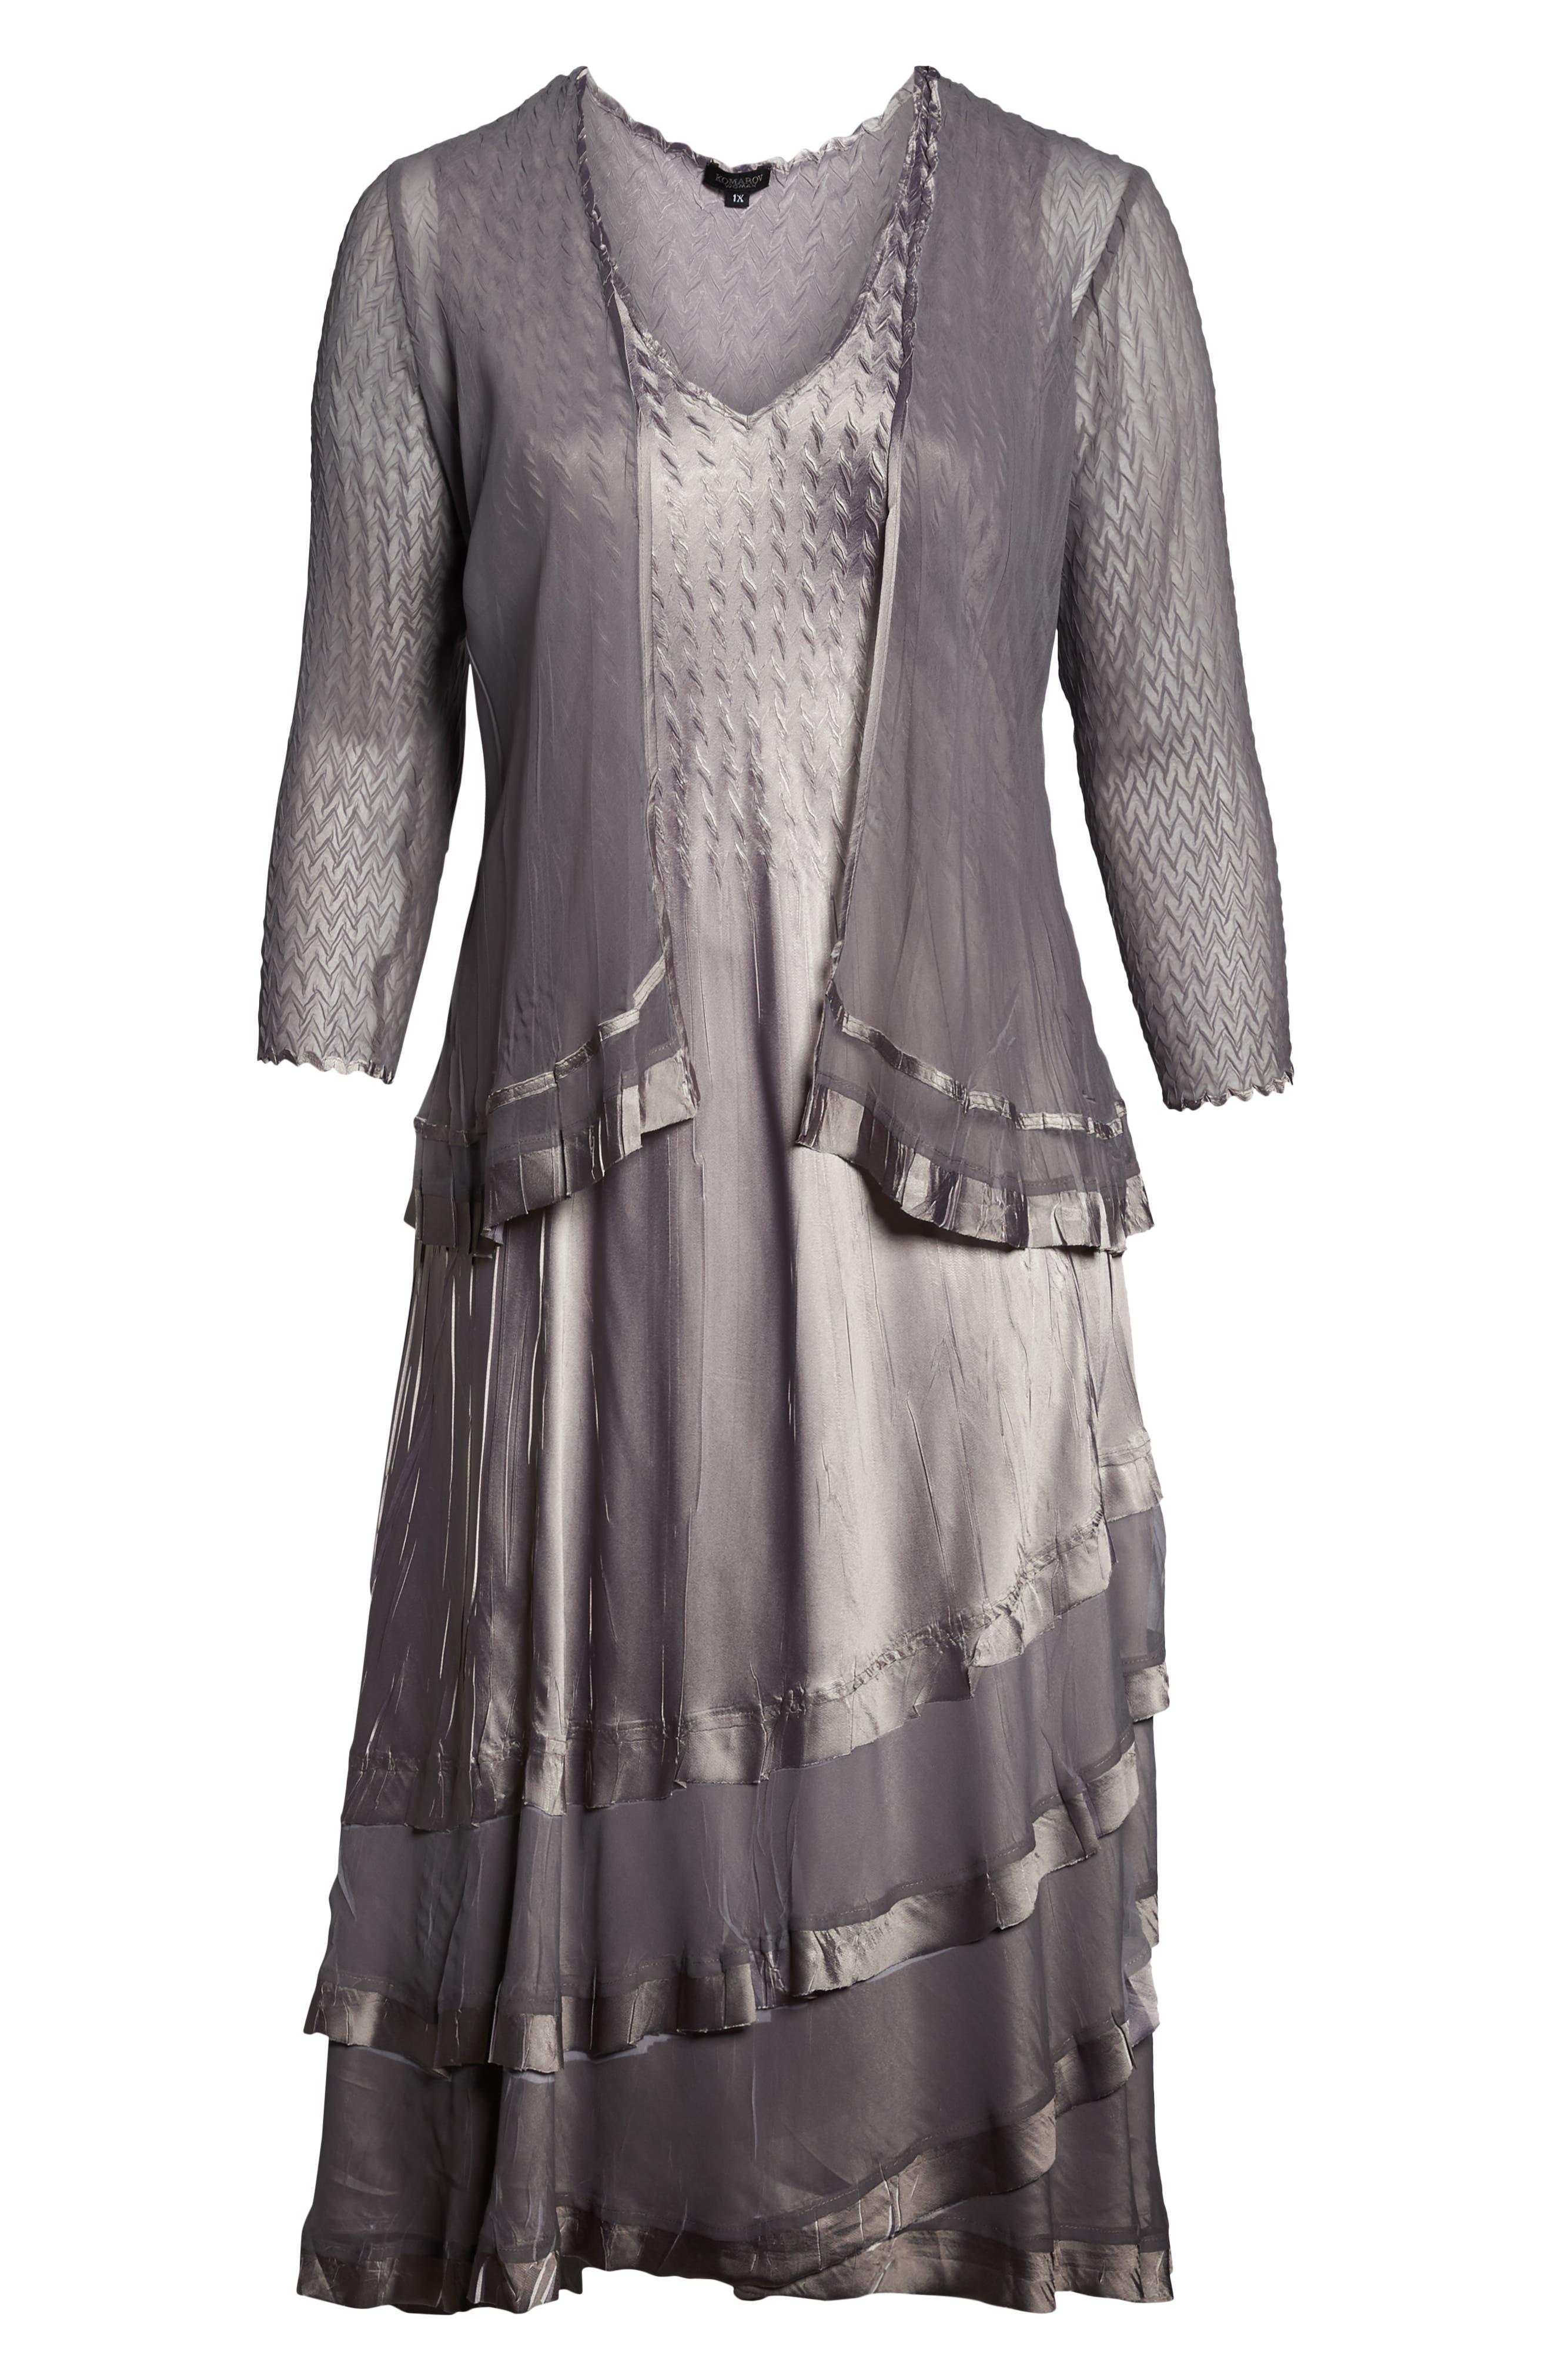 KOMAROV, Charmeuse Tiered Hem Dress with Chiffon Jacket, Alternate thumbnail 2, color, OYSTER SMOKE OMBRE